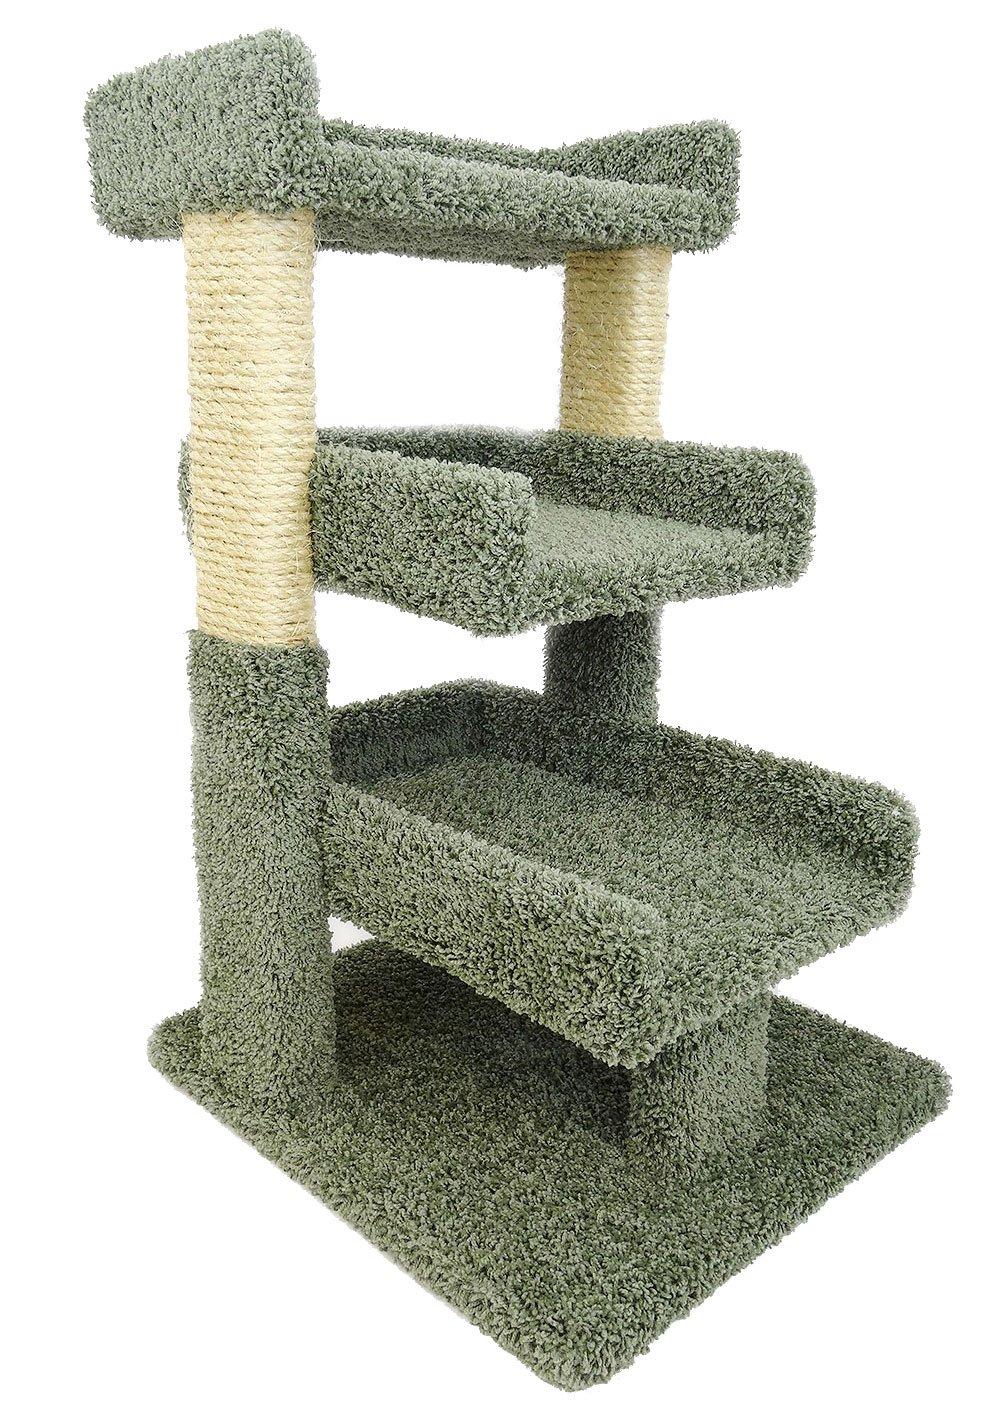 amazoncom  new cat condos premier triple cat perch beige  pet  - amazoncom  new cat condos premier triple cat perch beige  pet supplies